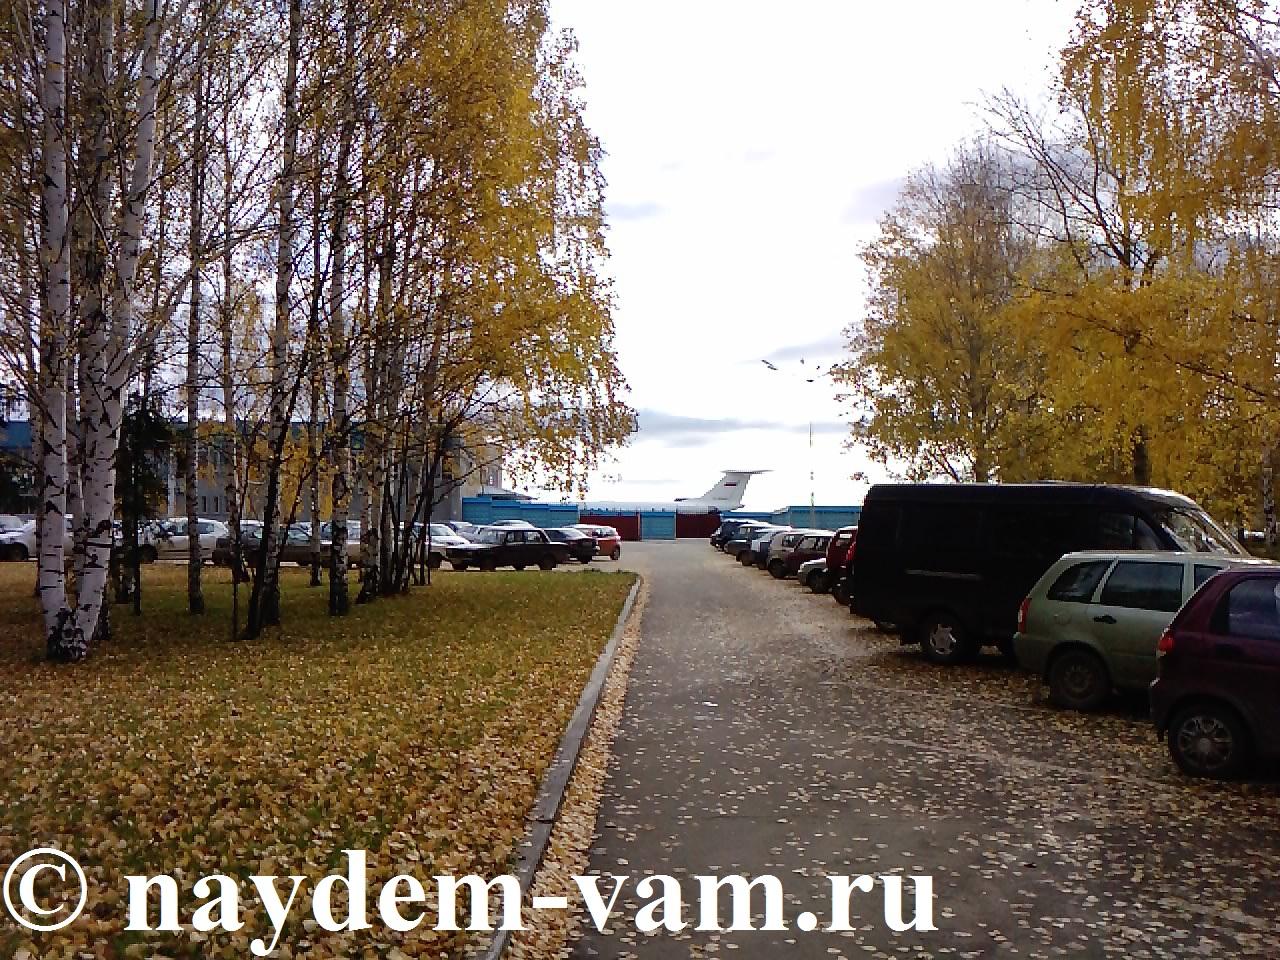 http://s7.uploads.ru/1LlMB.jpg